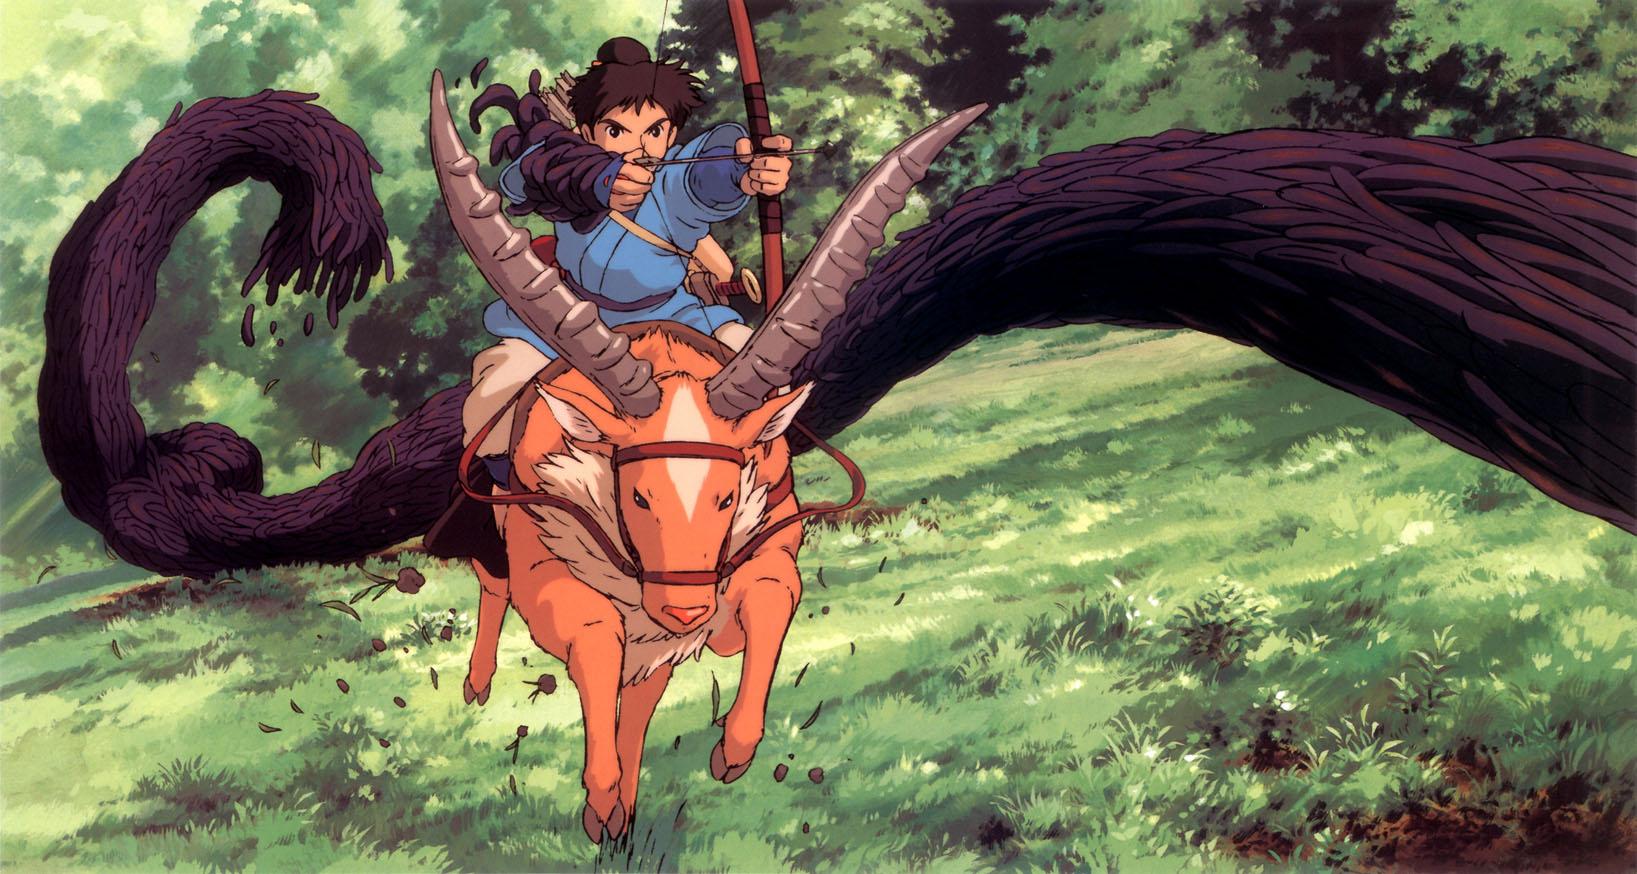 Princess-Mononoke-Poster-scene.jpeg